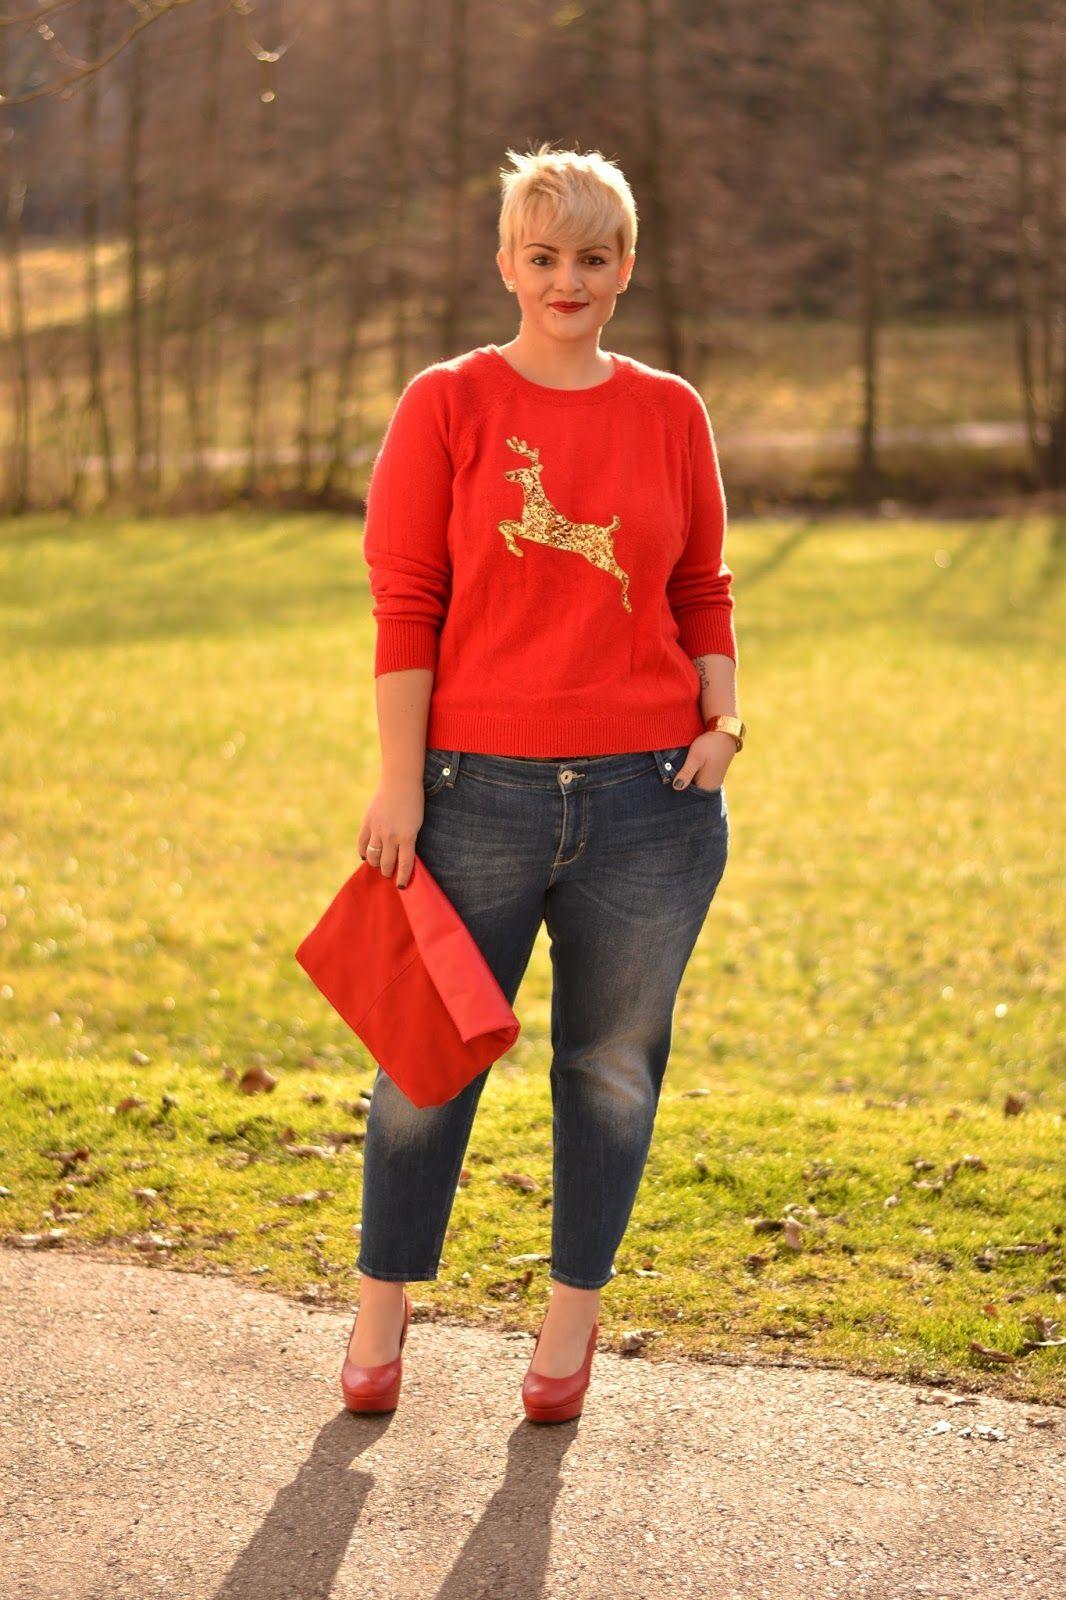 5899af1881525 Plus Size Fashion for Women - Plus Size Outit - Curvy Claudia: Christmas  Jumper Outfit